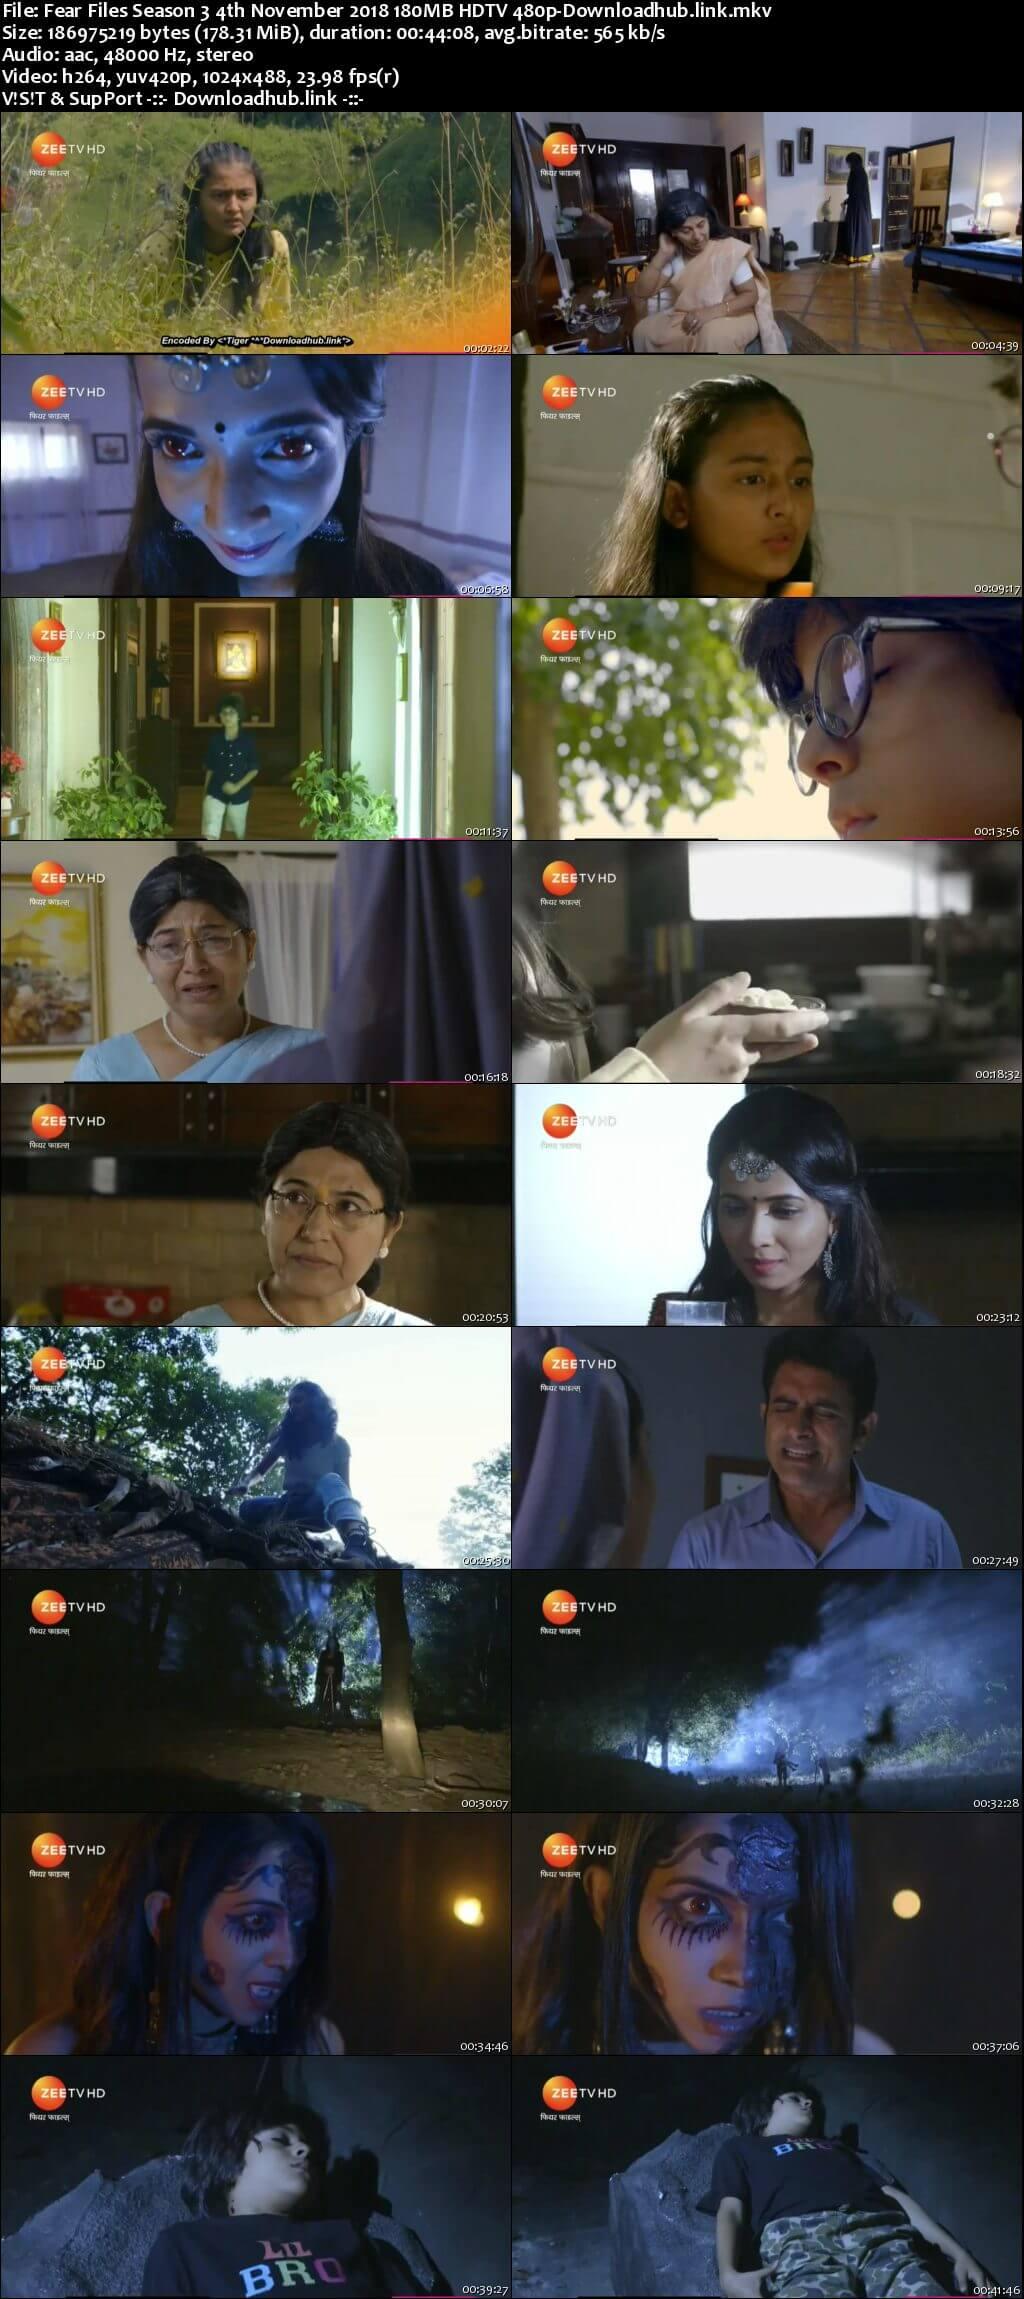 Fear Files Season 3 4th November 2018 180MB HDTV 480p